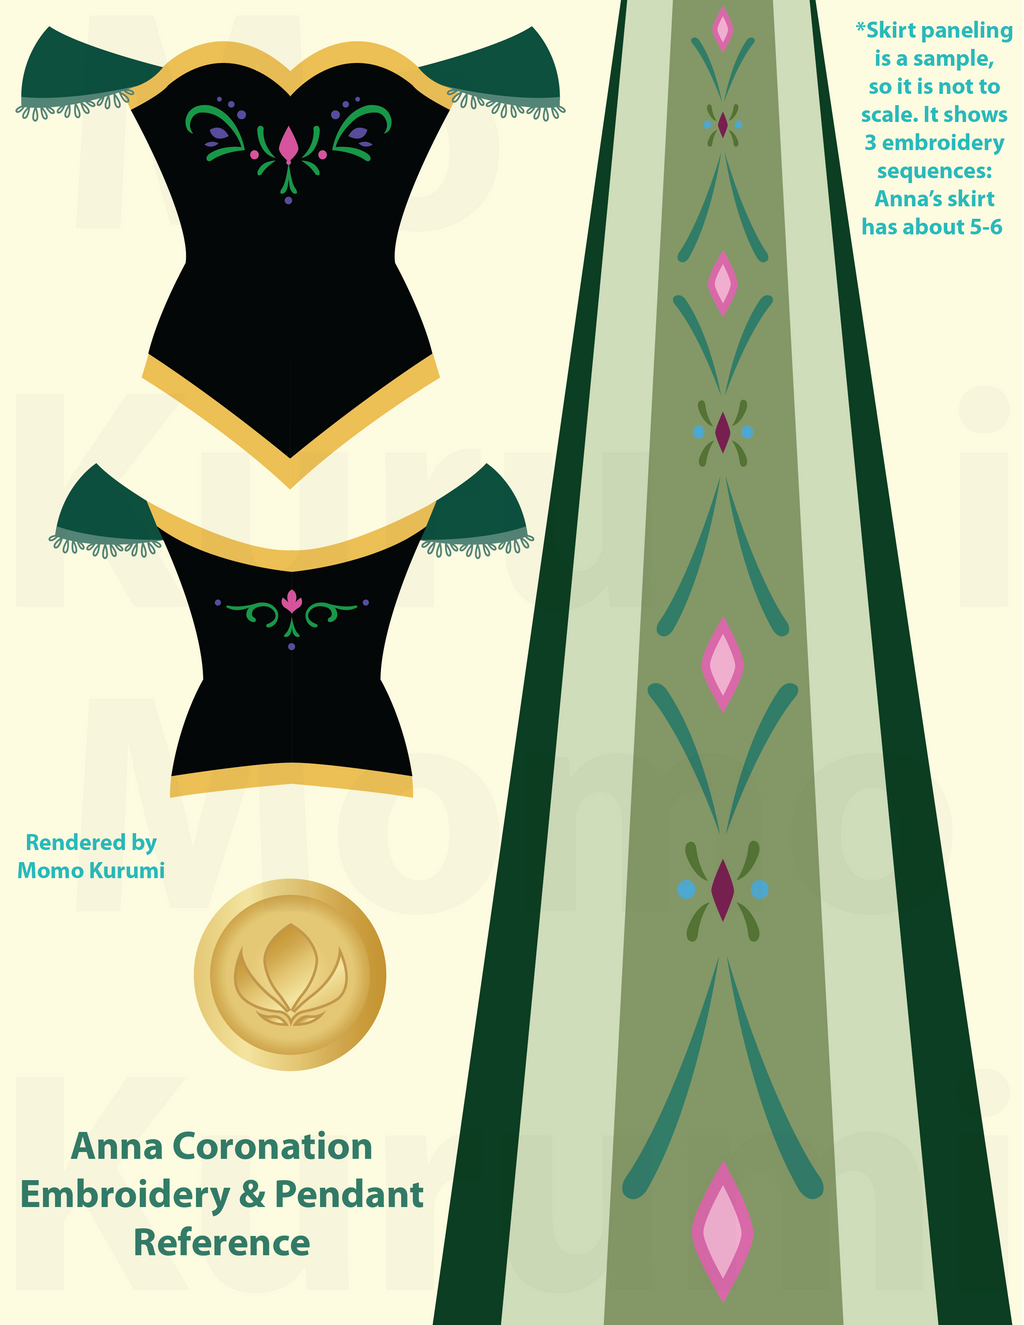 Princess Anna Coronation Embroidery References by MomoKurumi